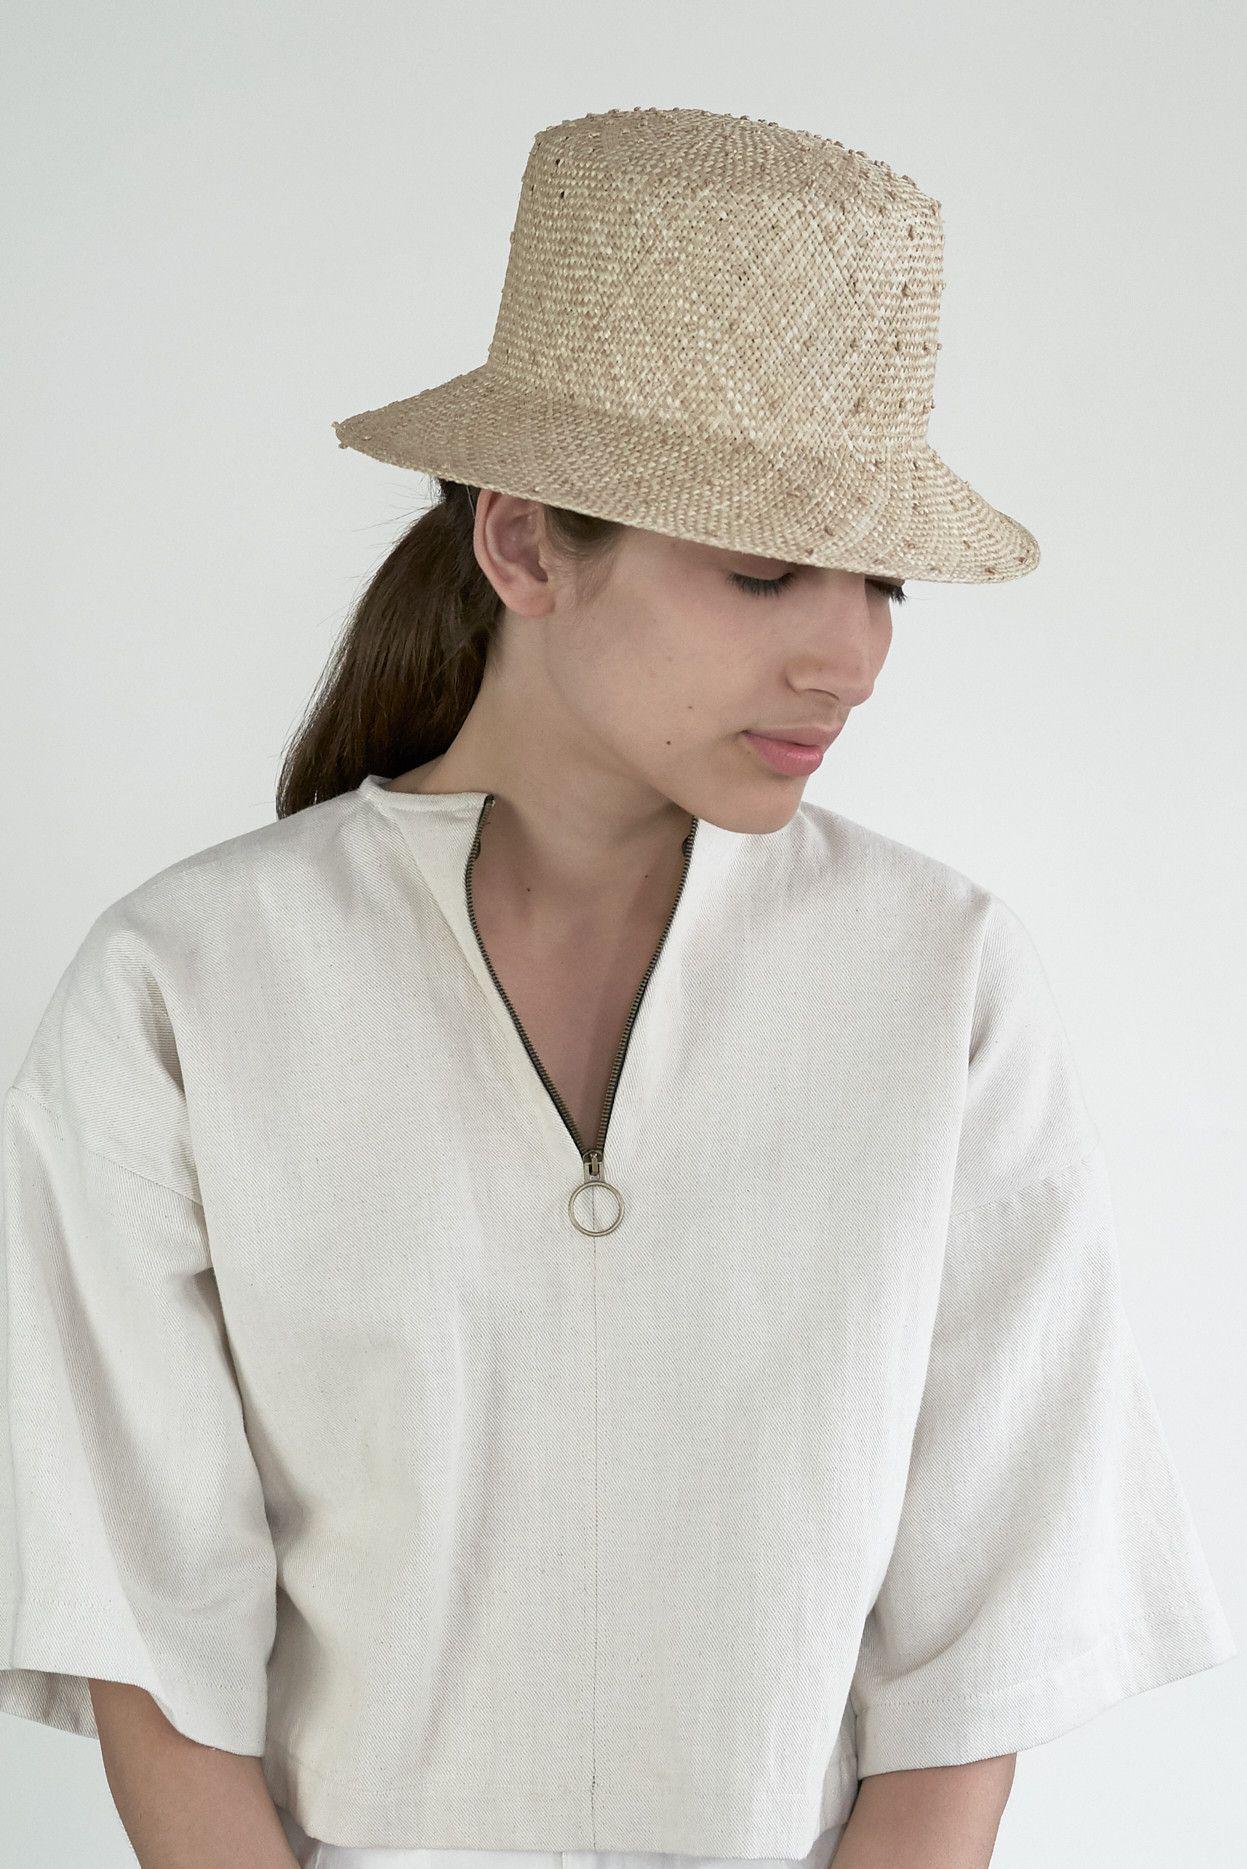 Short Brim Flat Top Hat in Cream Knotted